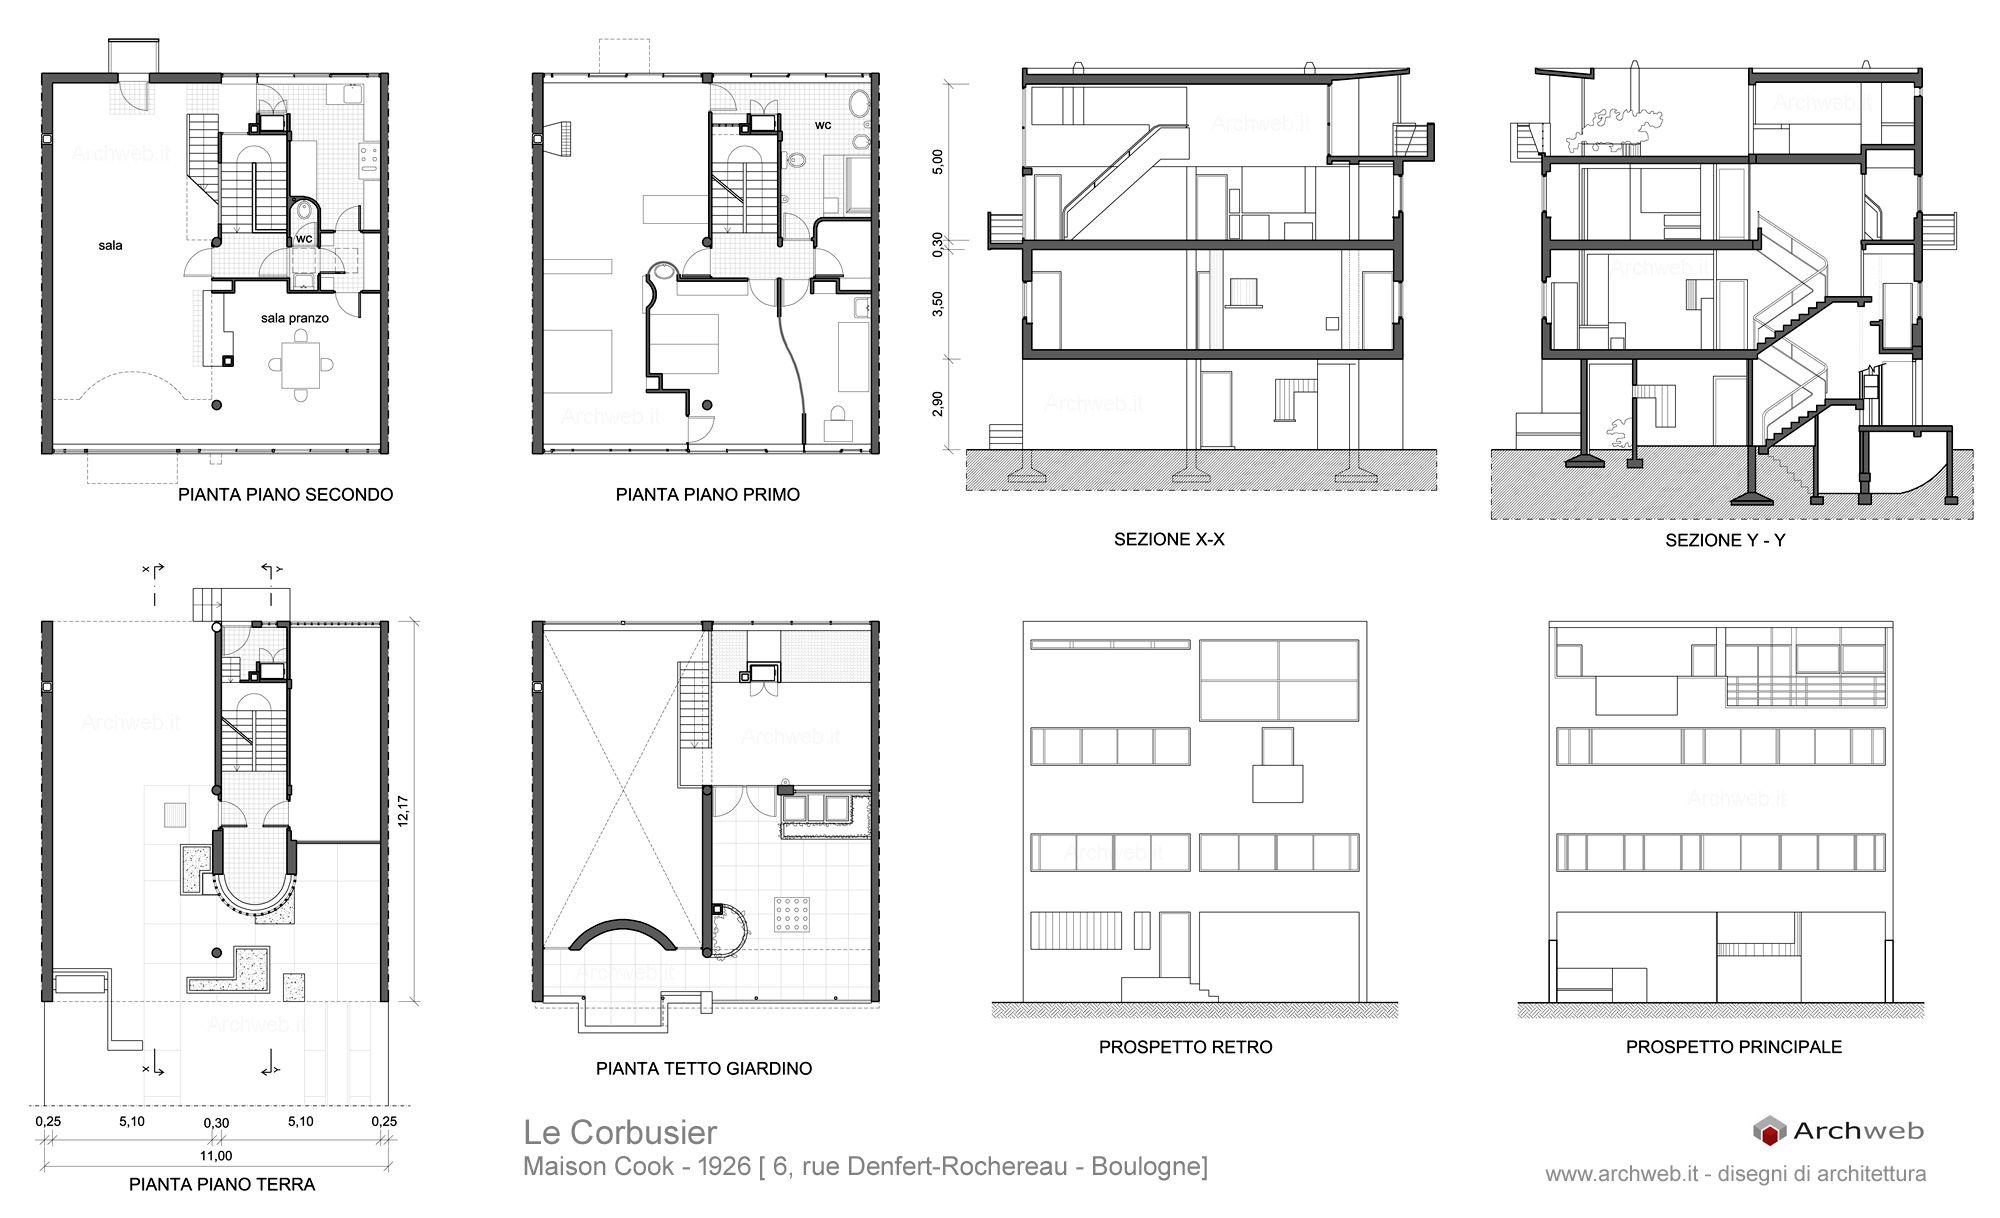 Maison Cook Le Corbusier 1926 Architettura